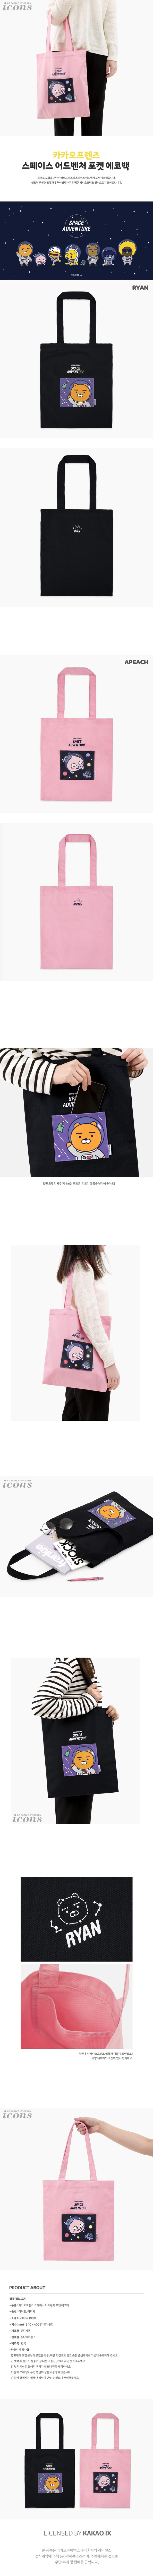 [Kakao Friends] Adventure Pocket Eco Bag -holiholic.com